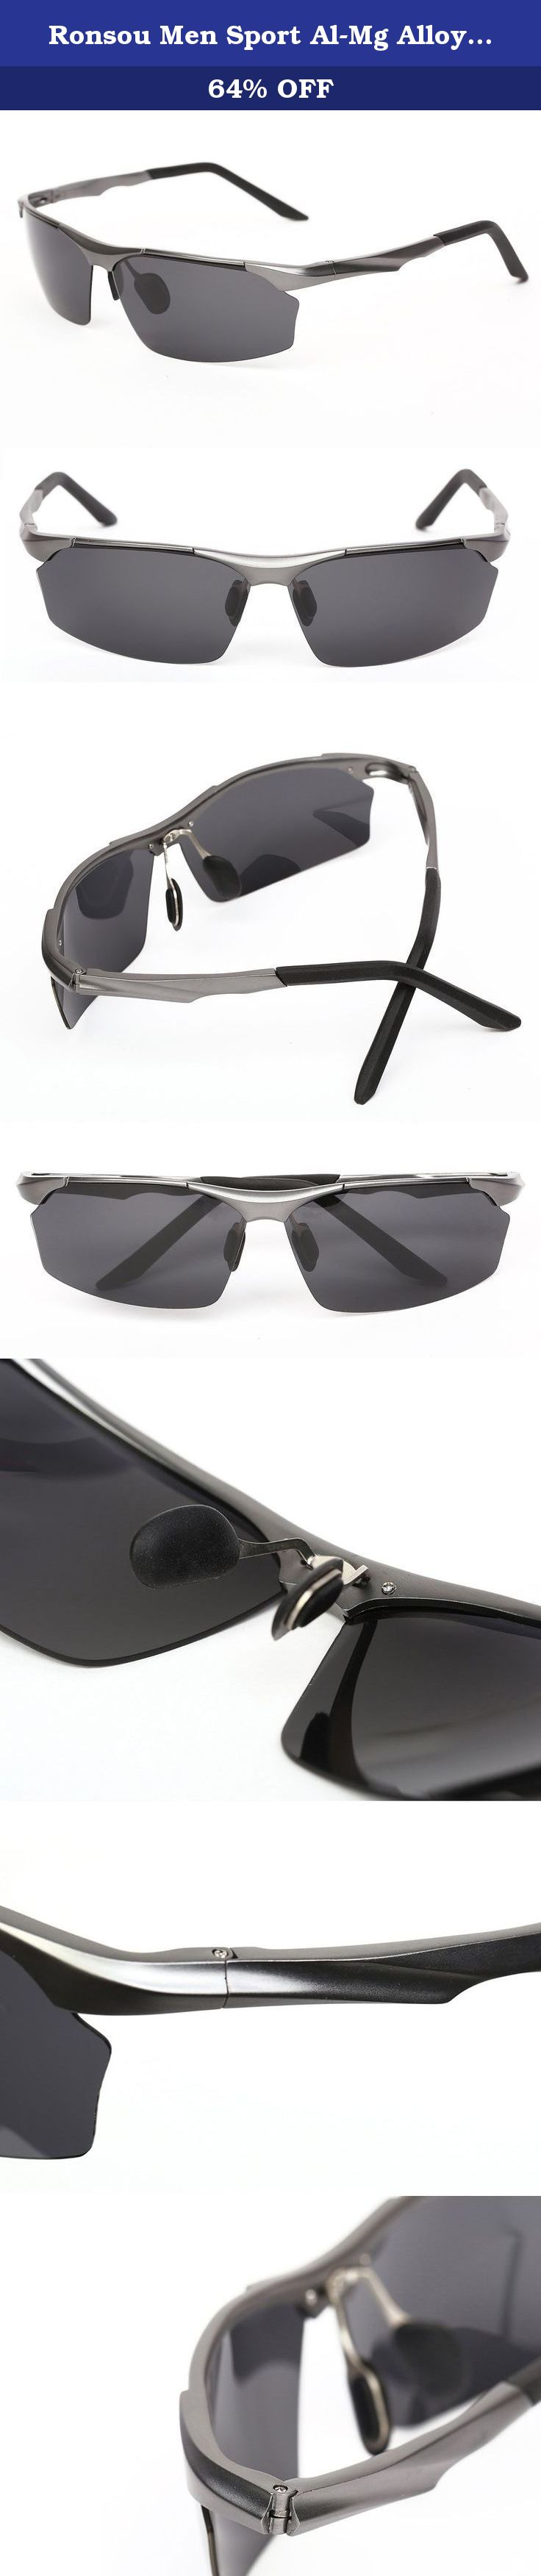 1091f78c81 Ronsou Men Sport Al-Mg Alloy Frame Polarized Sunglasses Fashion Driving  eyewear gray frame